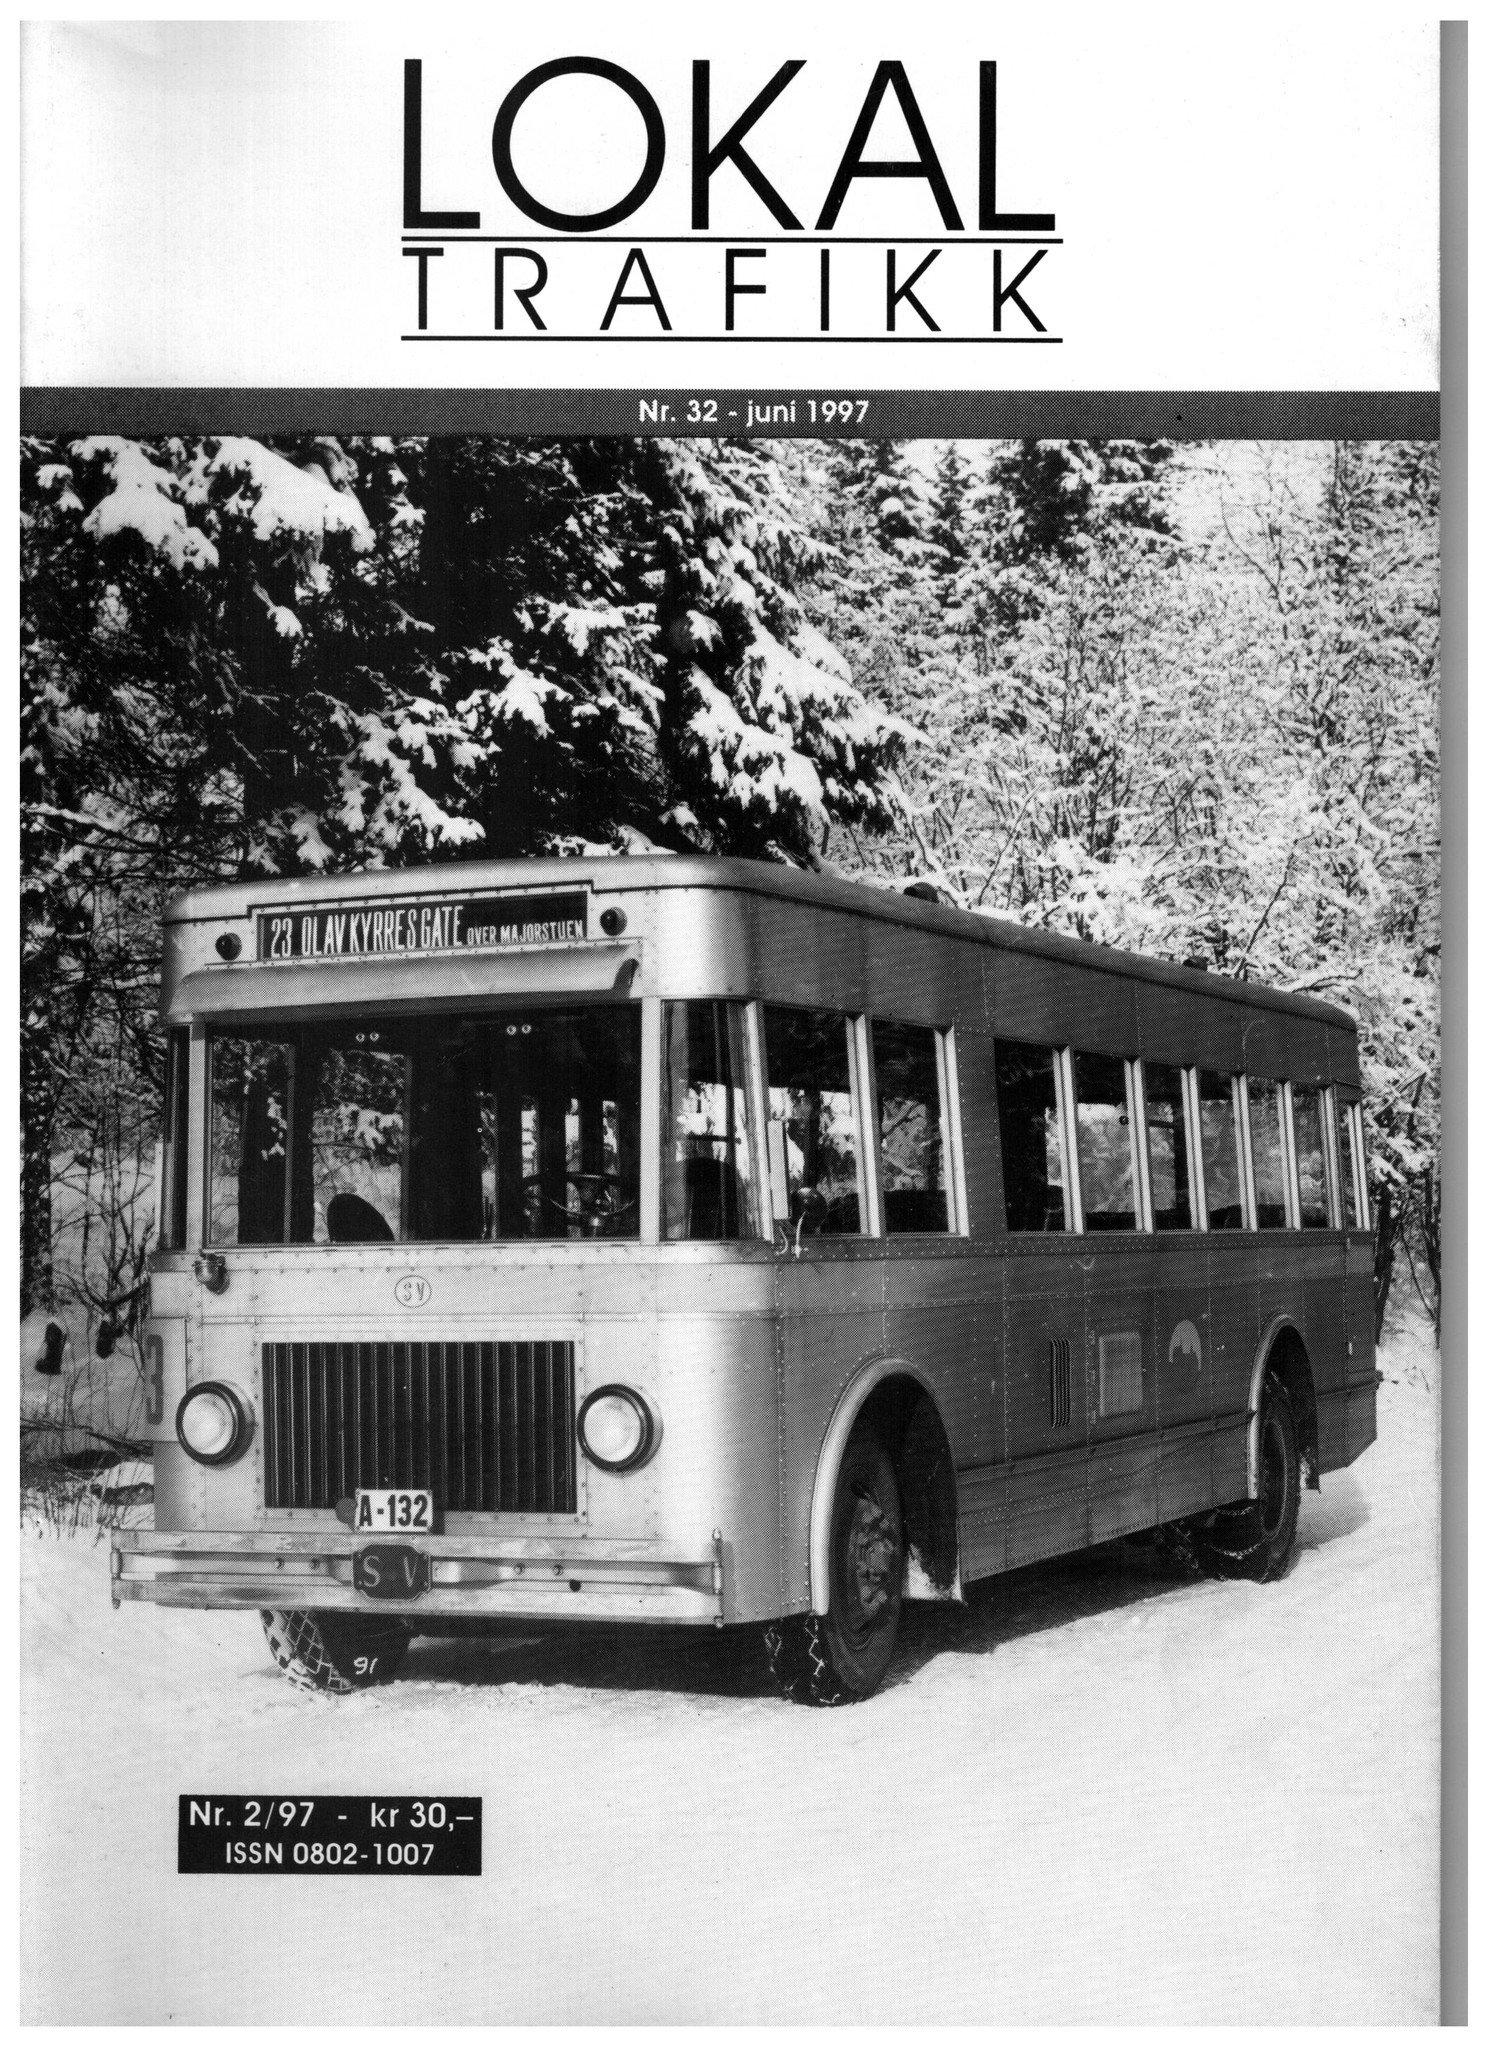 Lokaltrafikk #032